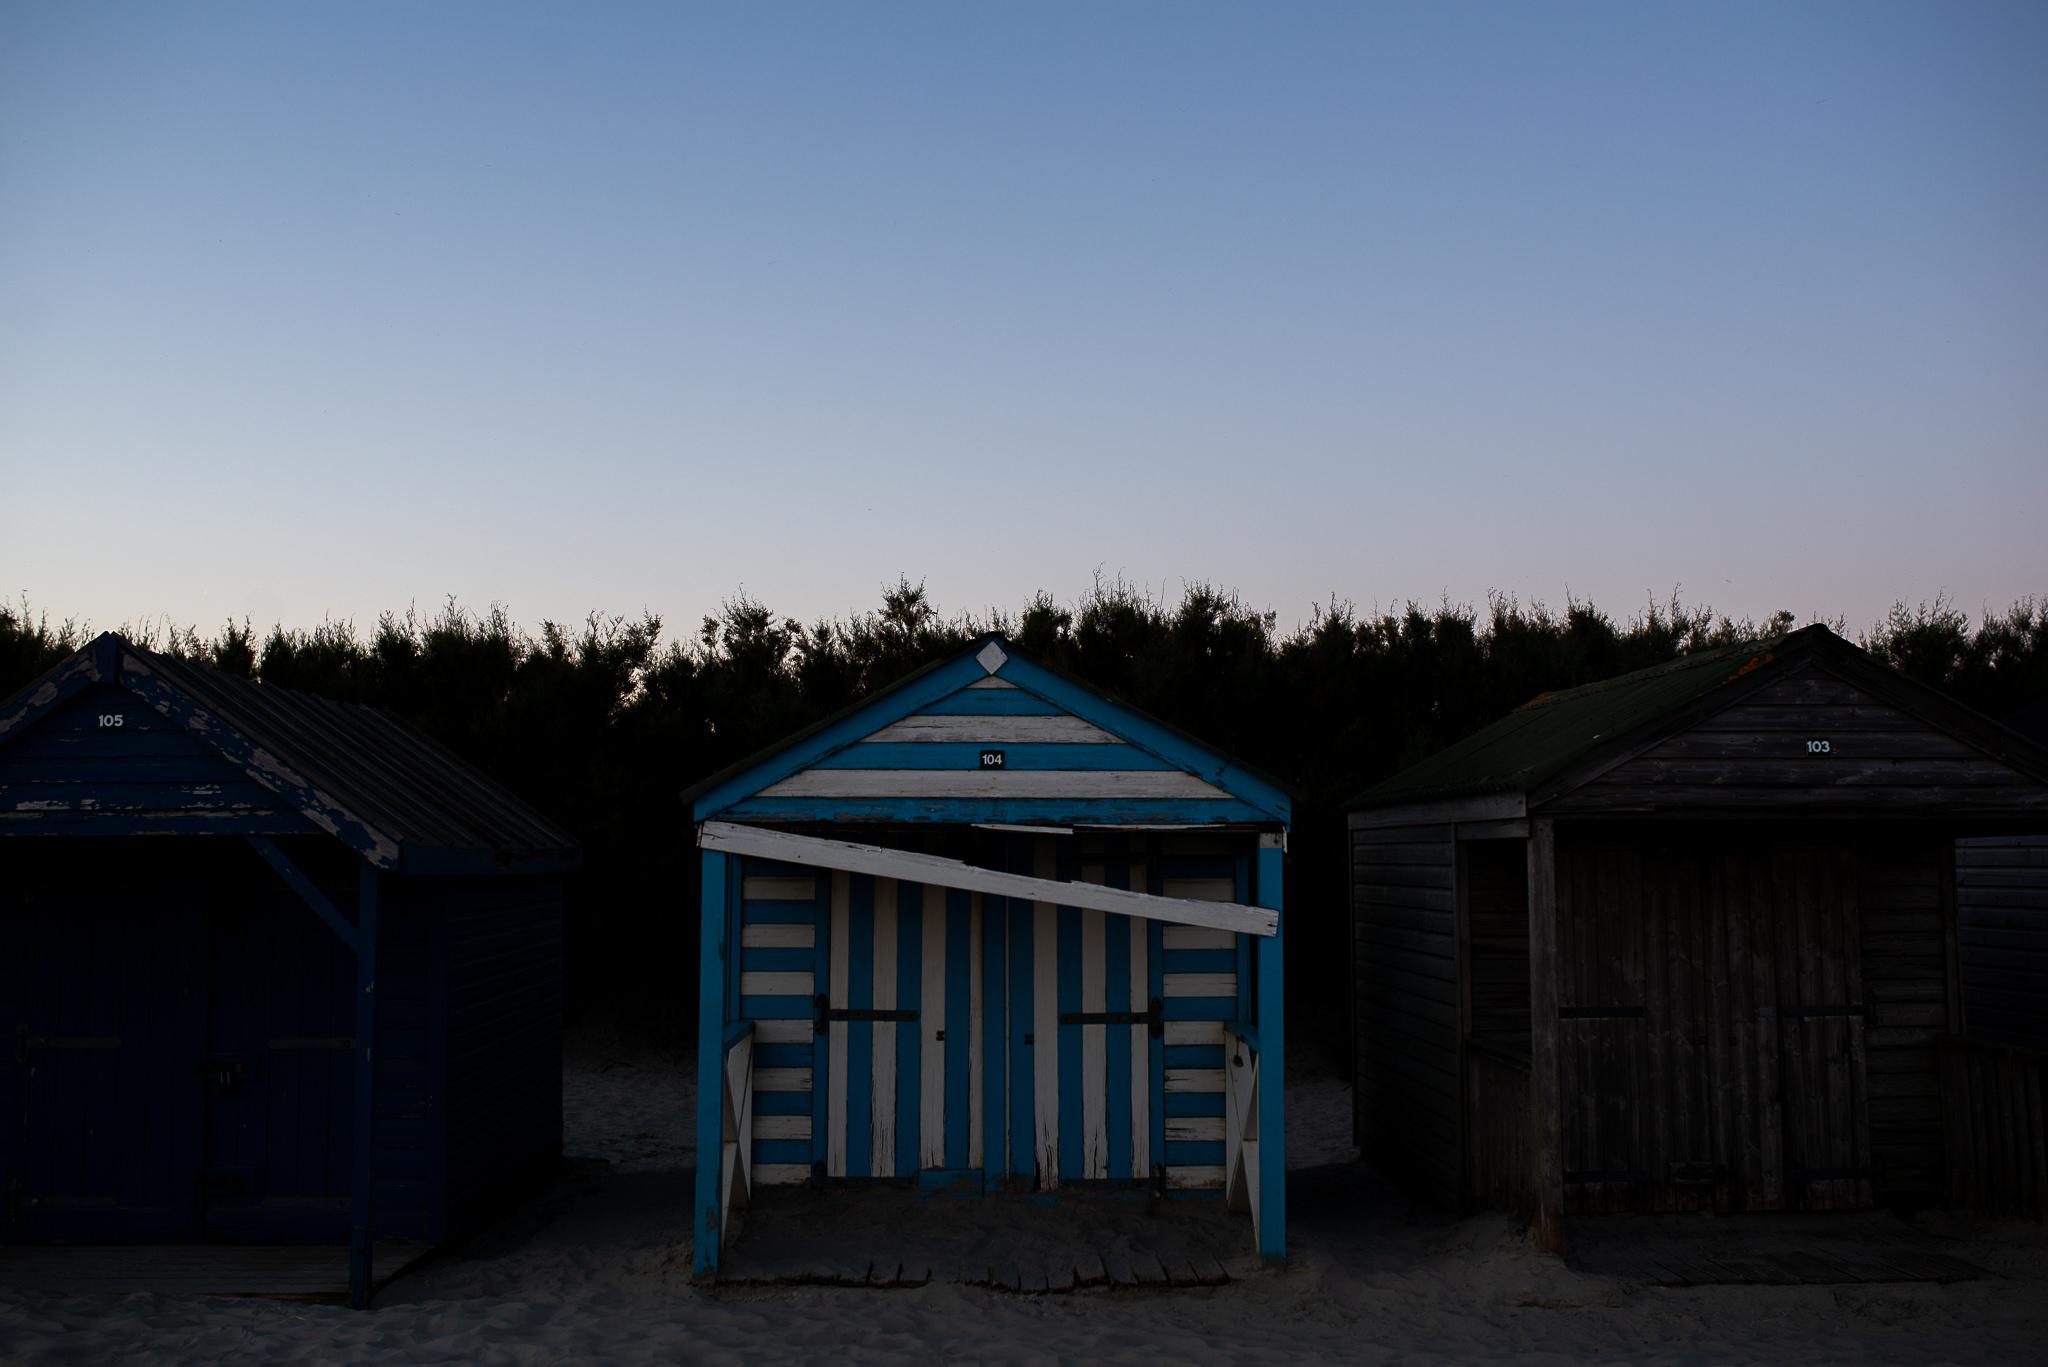 West-Wittering-Beach-Daniel-Robinson-Photography-22.jpg